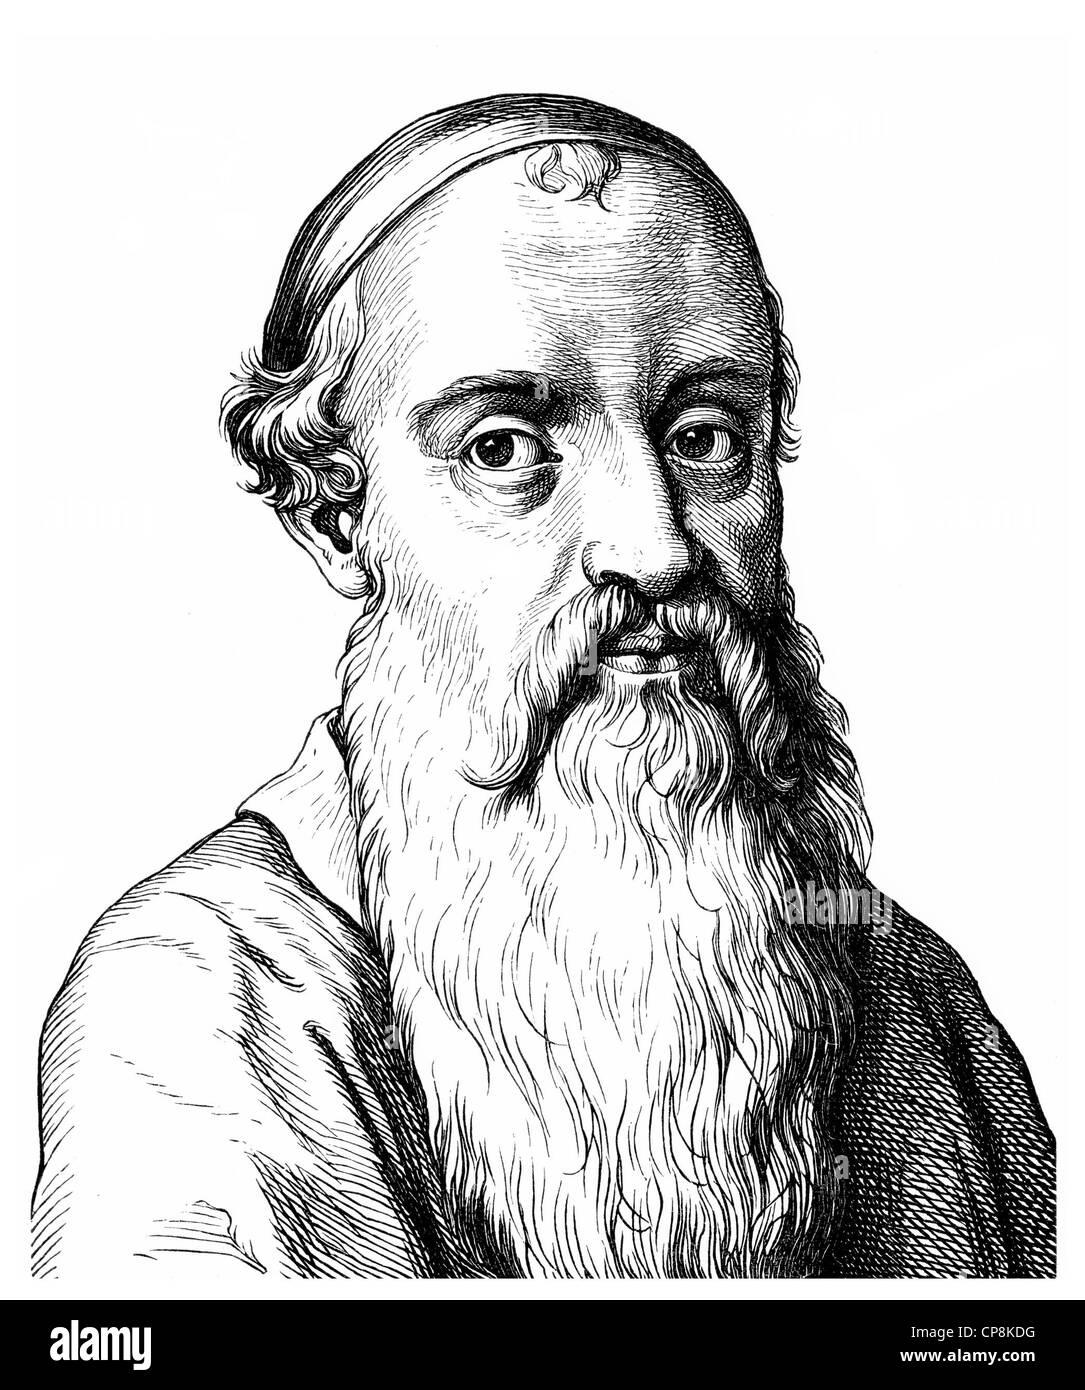 Menno Simons or Simonis, 1496 - 1561, a Dutch-Frisian theologian and Anabaptist, Historische Zeichnung aus dem 19. Stock Photo